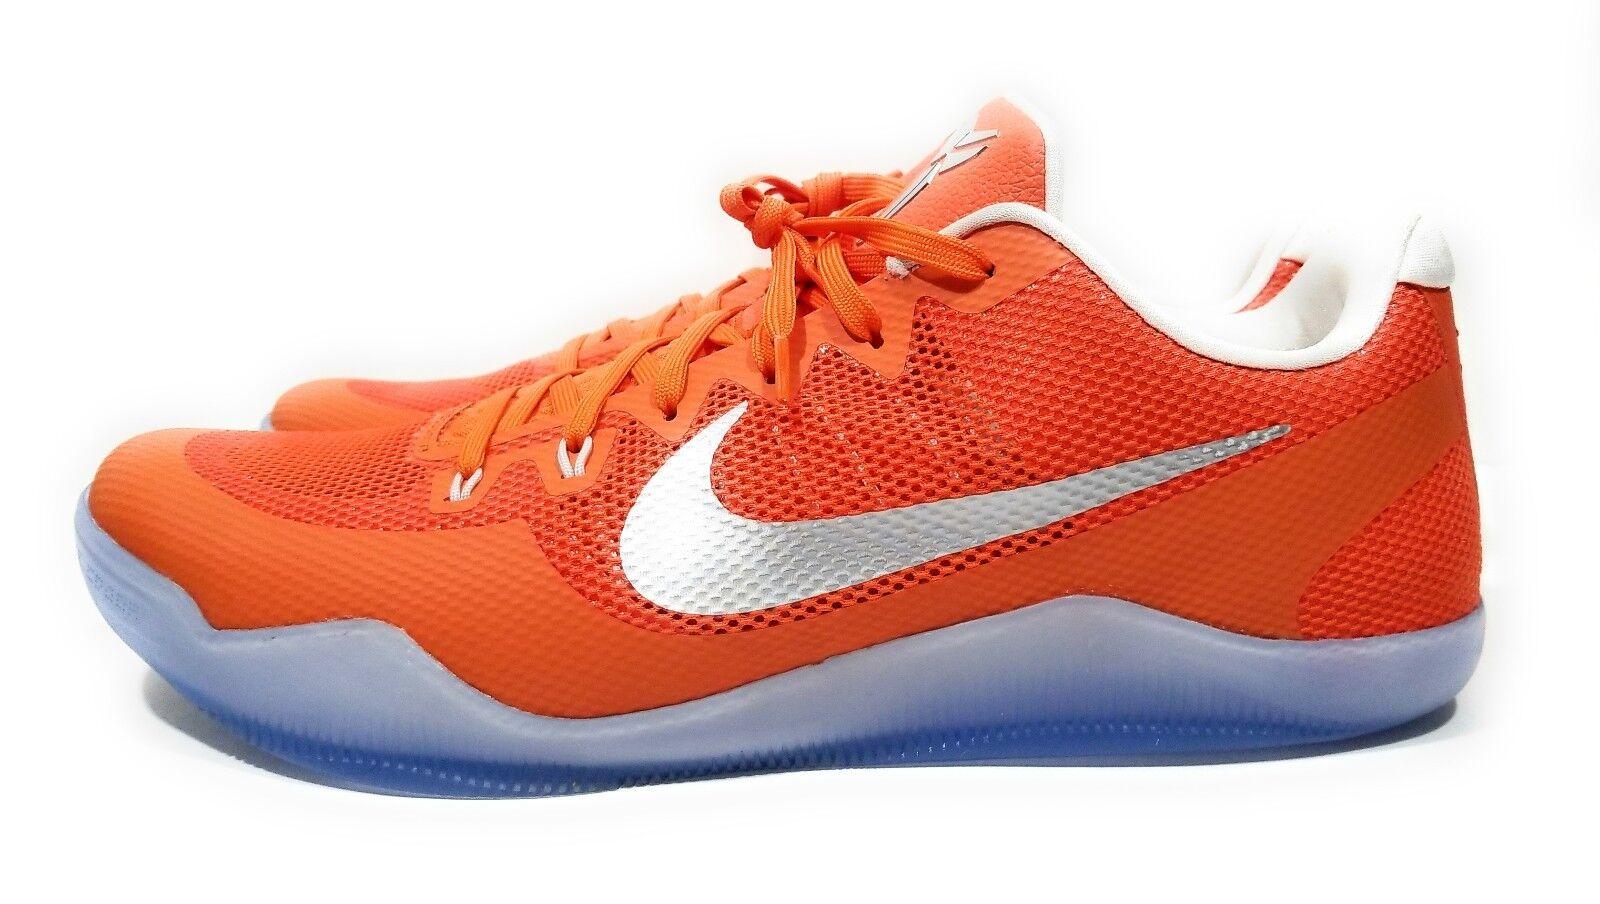 Nike Kobe XI 11 Low TB Promo Mens Basketball shoes orange Size 18